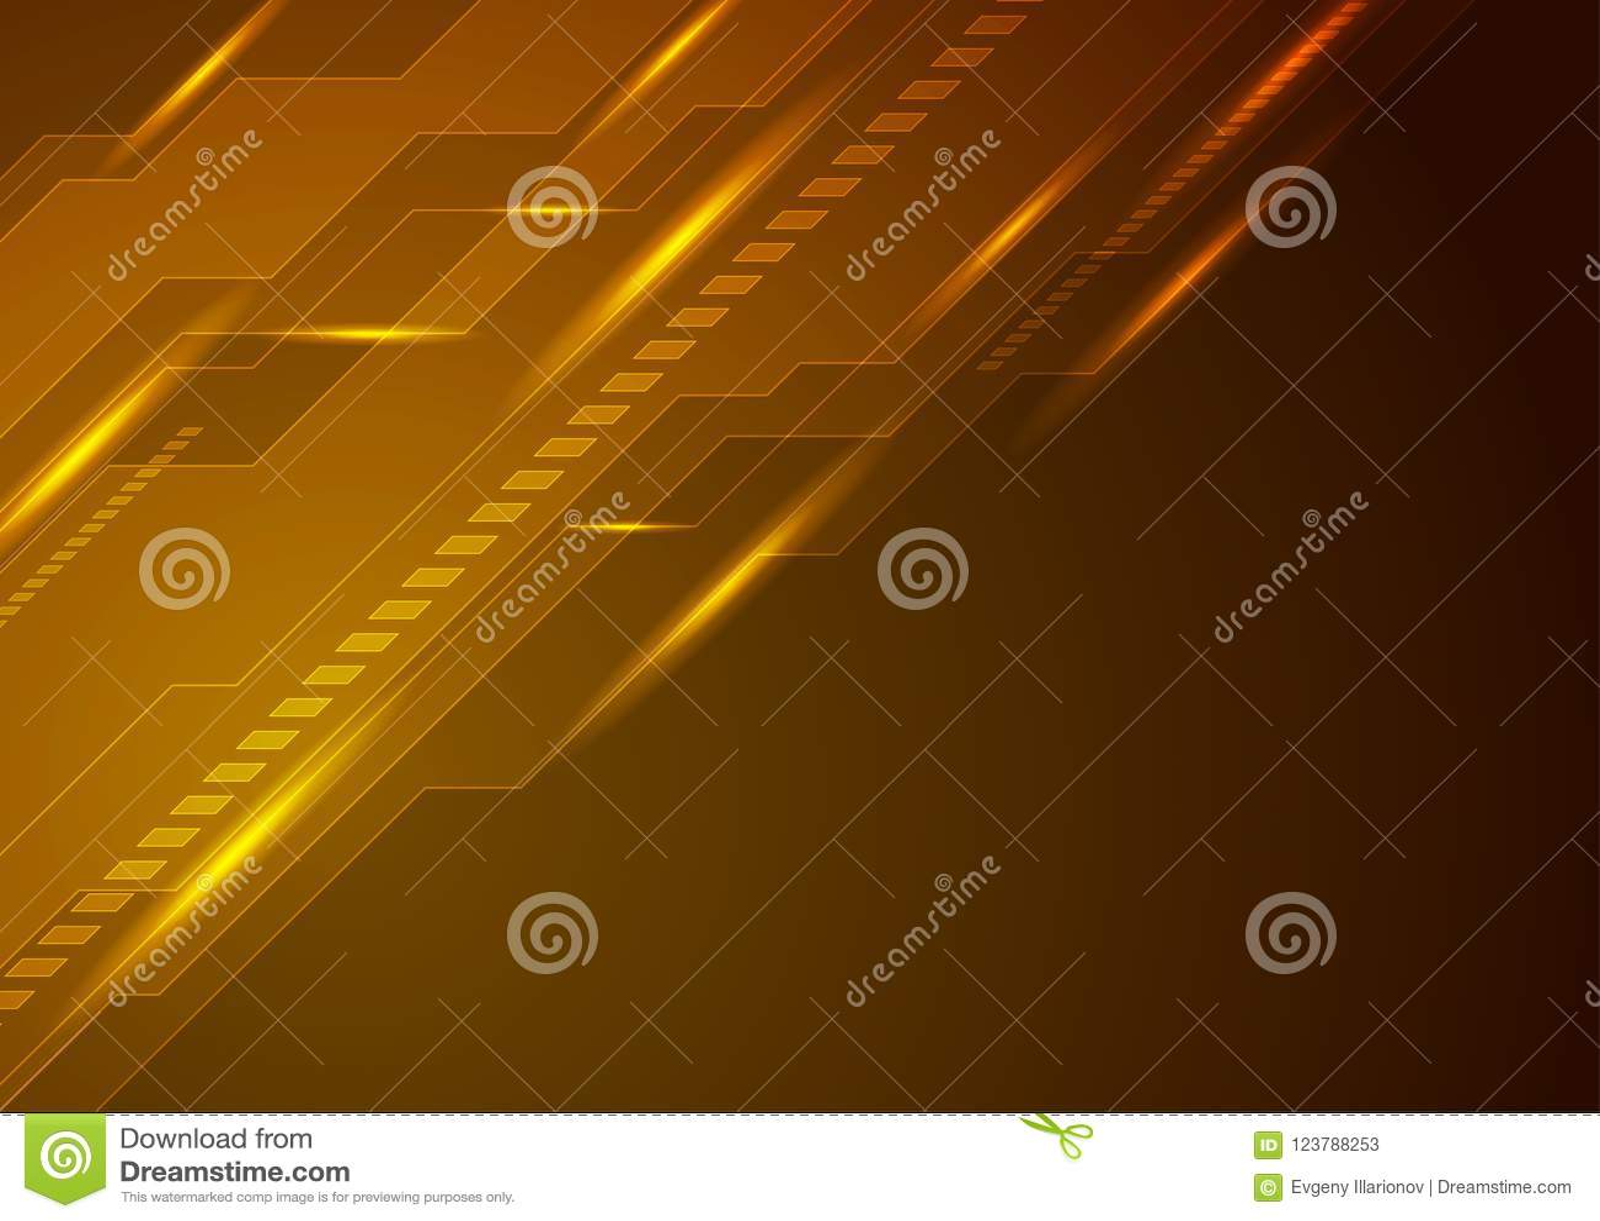 dark orange technology futuristic background stock vector